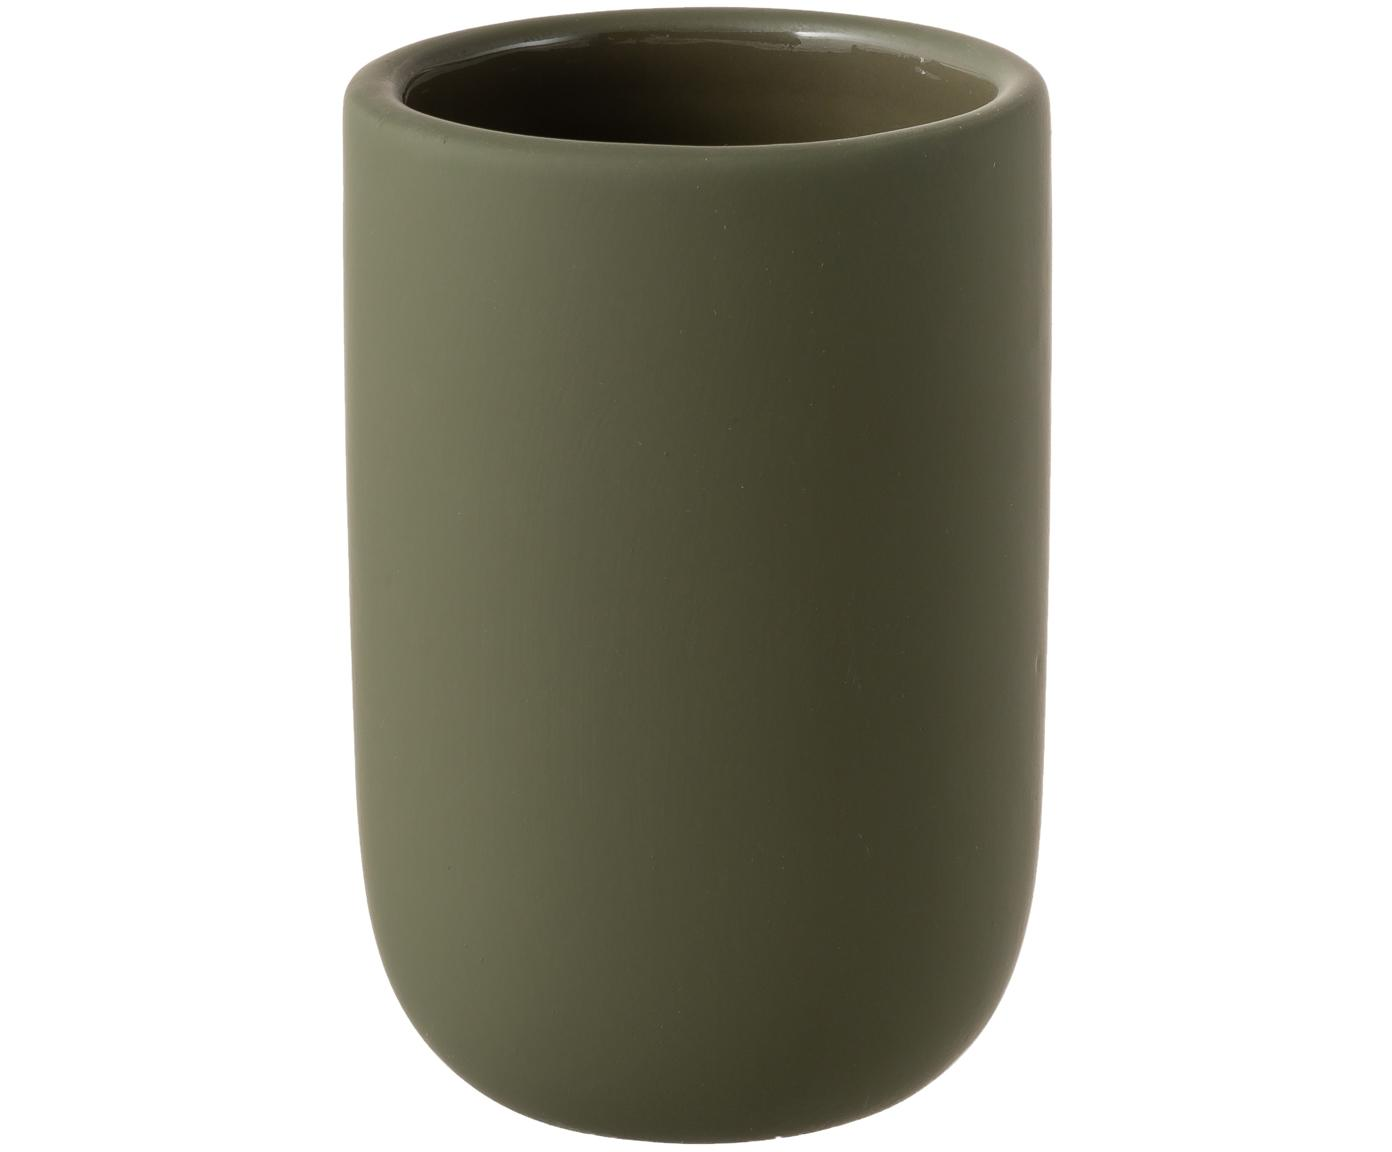 Keramik-Zahnputzbecher Lotus, Keramik, Olivengrün, Ø 7 x H 10 cm